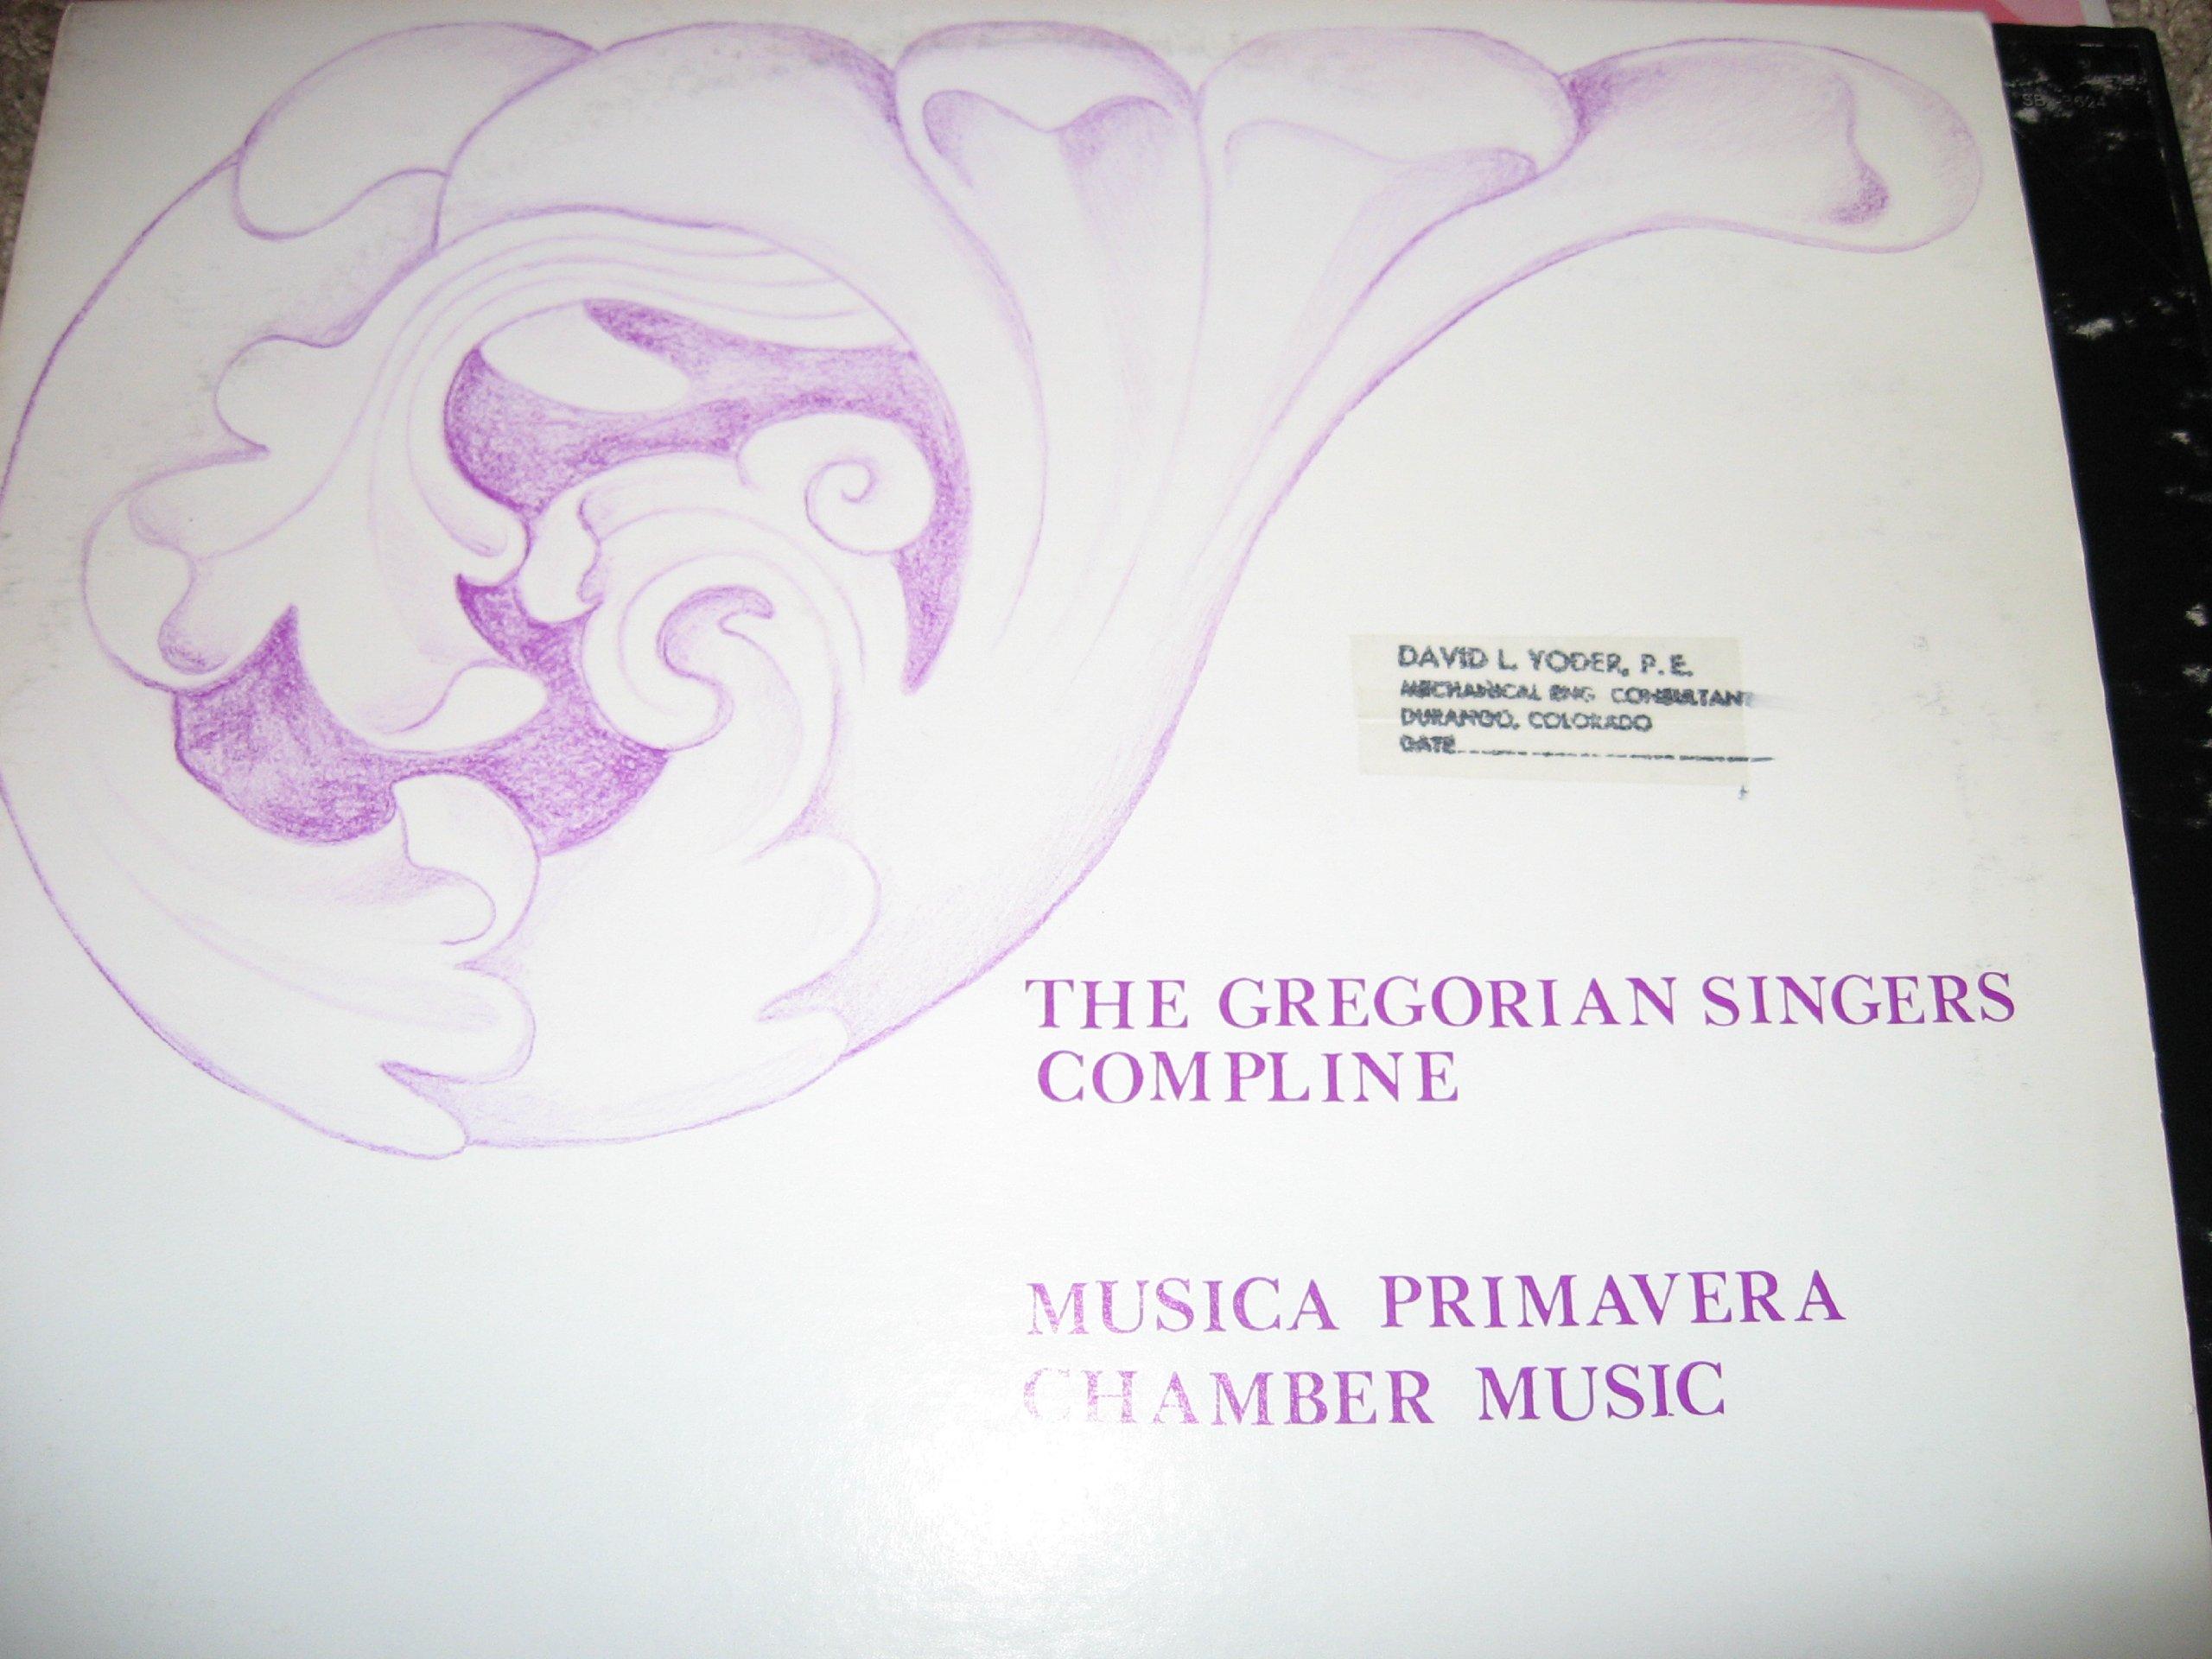 Compline - The Gregorian Singers / Chamber Music - Musica Primavera by Troisieme Concert